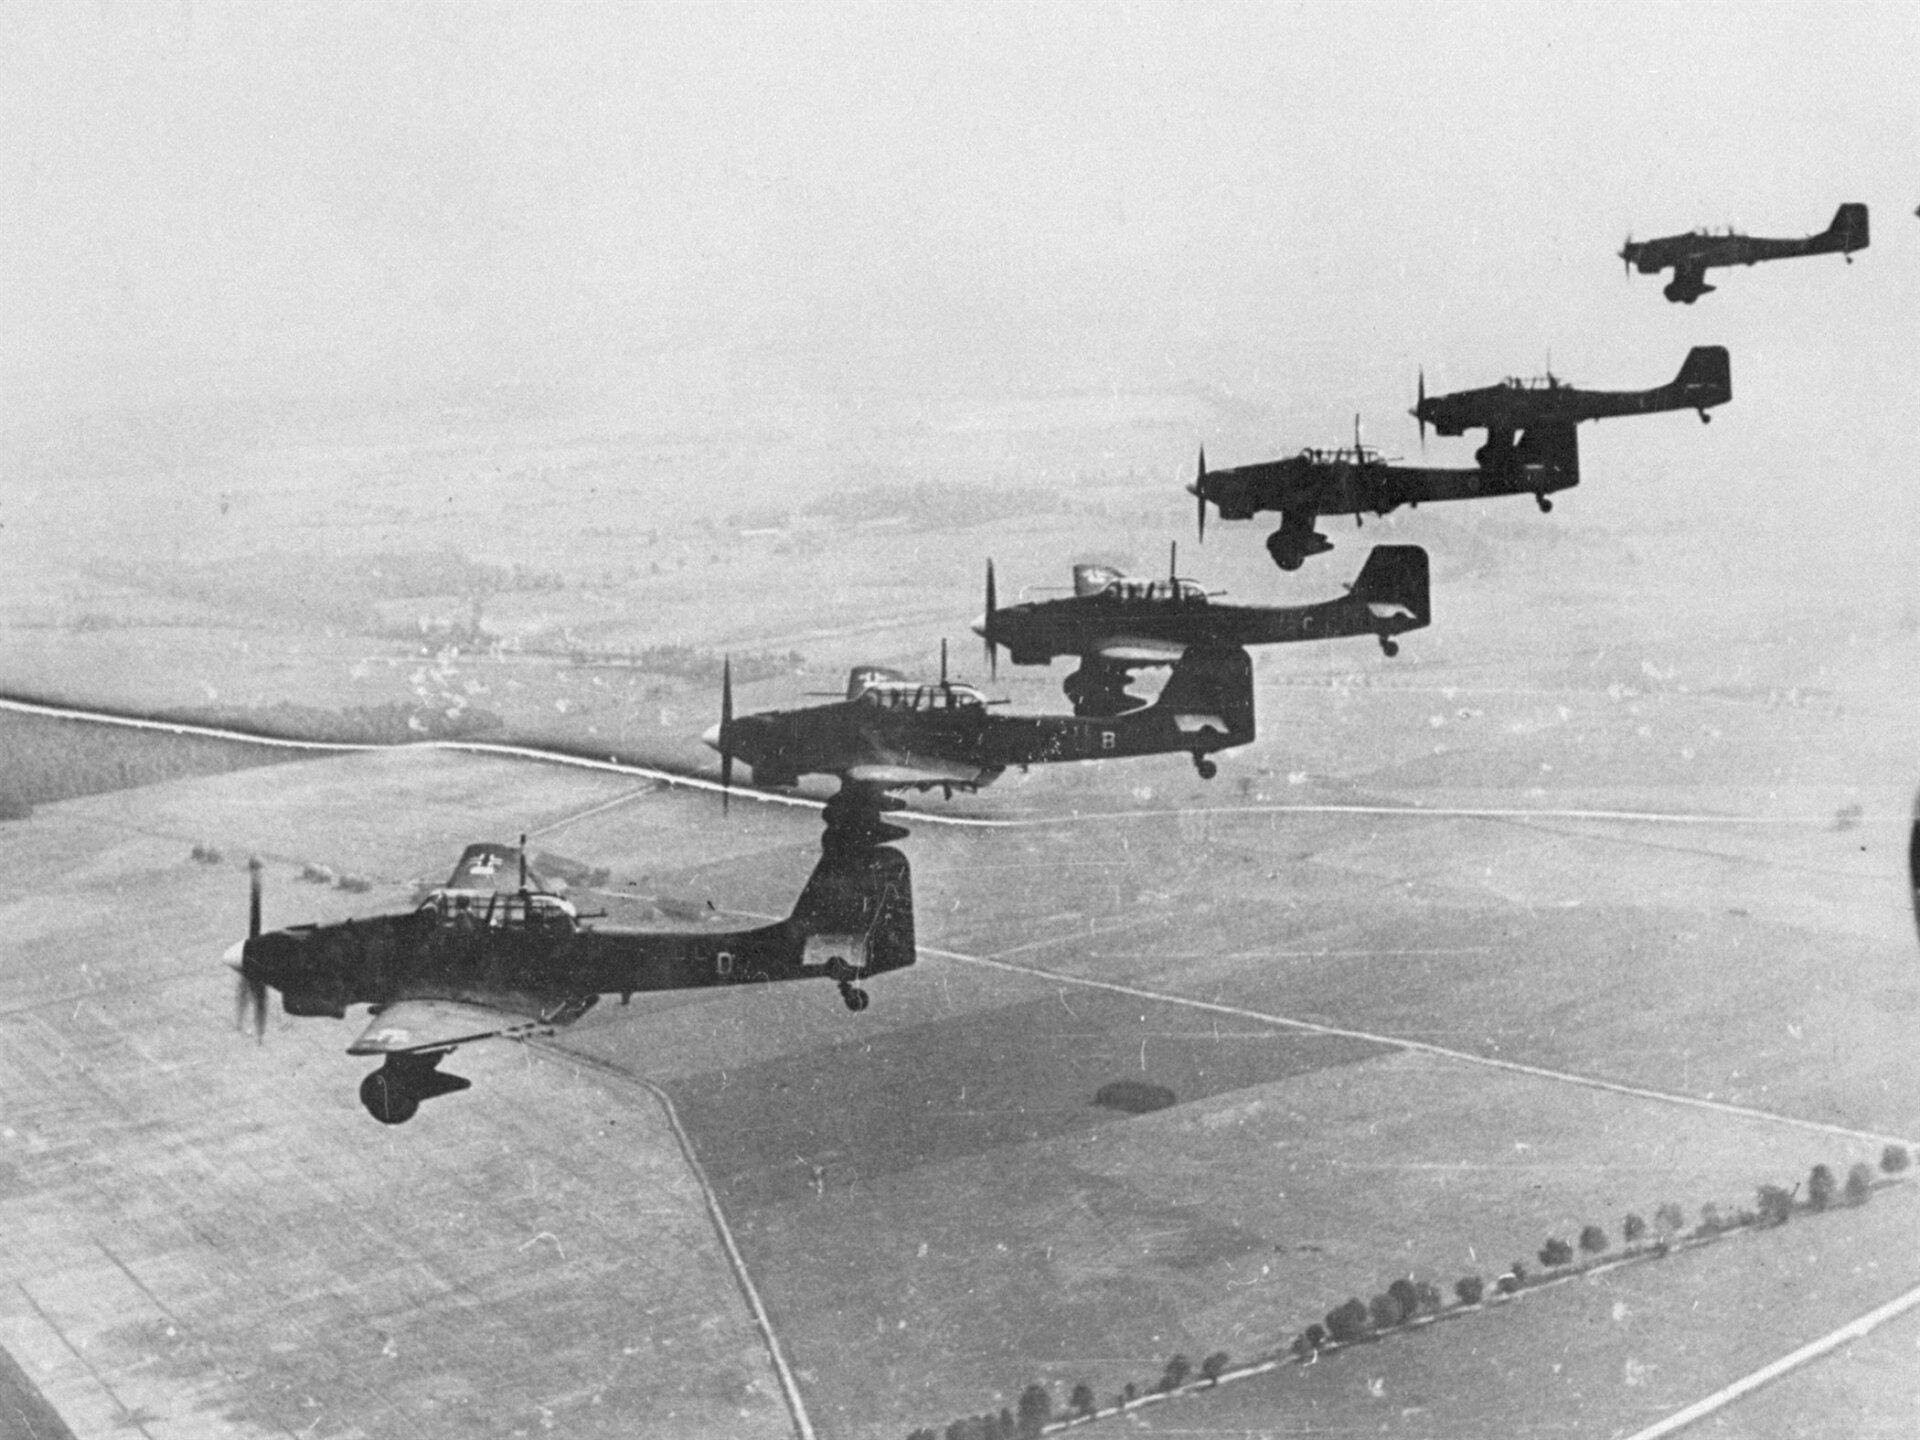 Bombowce Junkers Ju 87 nad Polską Zdjęcie nr 3 Źródło: Bundesarchiv, Bombowce Junkers Ju 87 nad Polską, German Federal Archives, licencja: CC BY-SA 3.0.